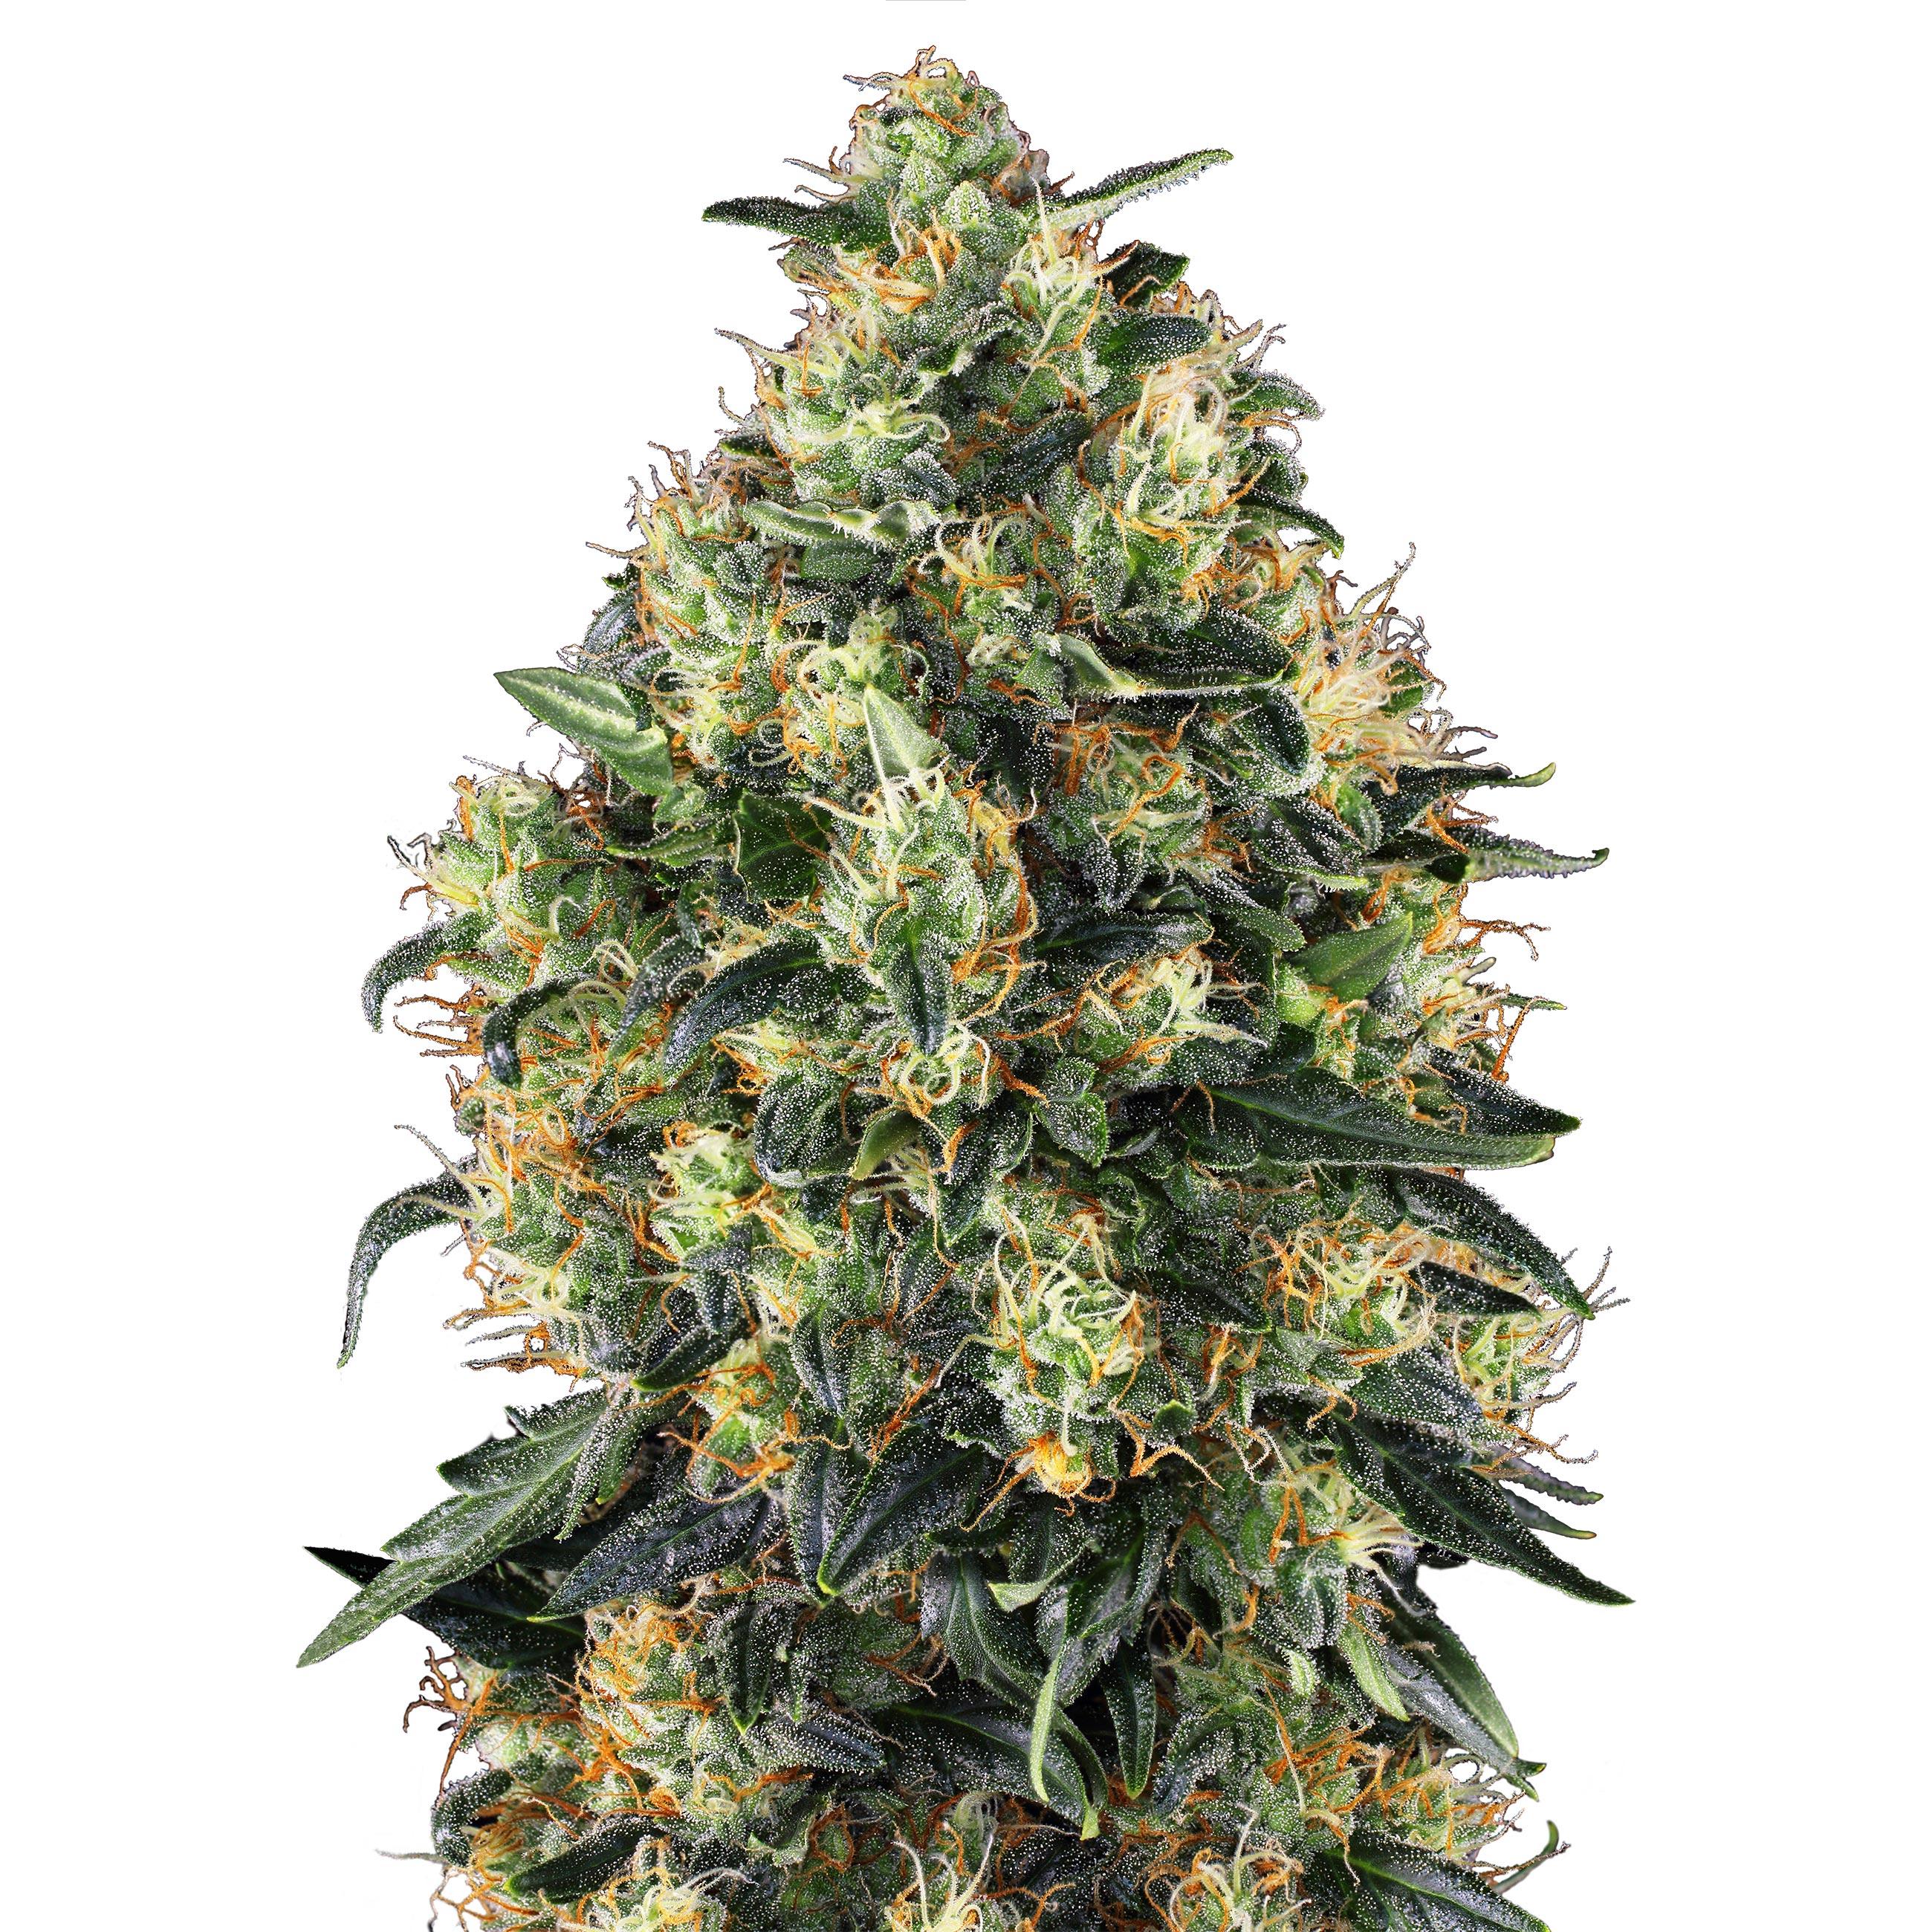 The 5 best autoflower cannabis seeds from Sensi Seeds